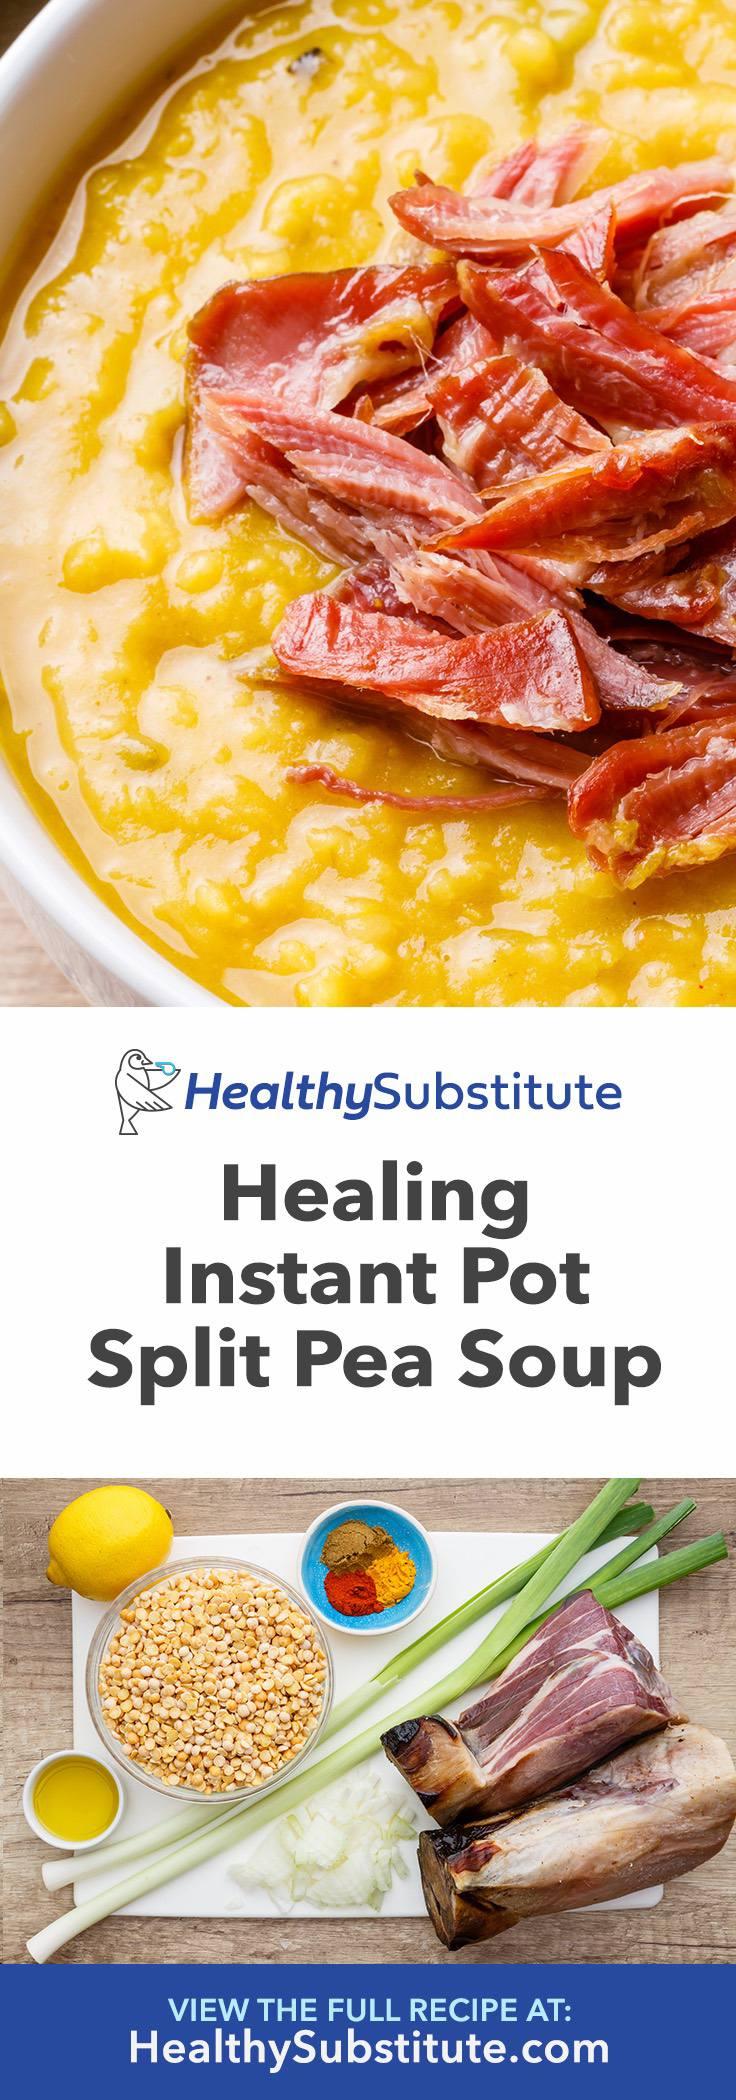 OMG-worthy Instant Pot Split Pea Soup